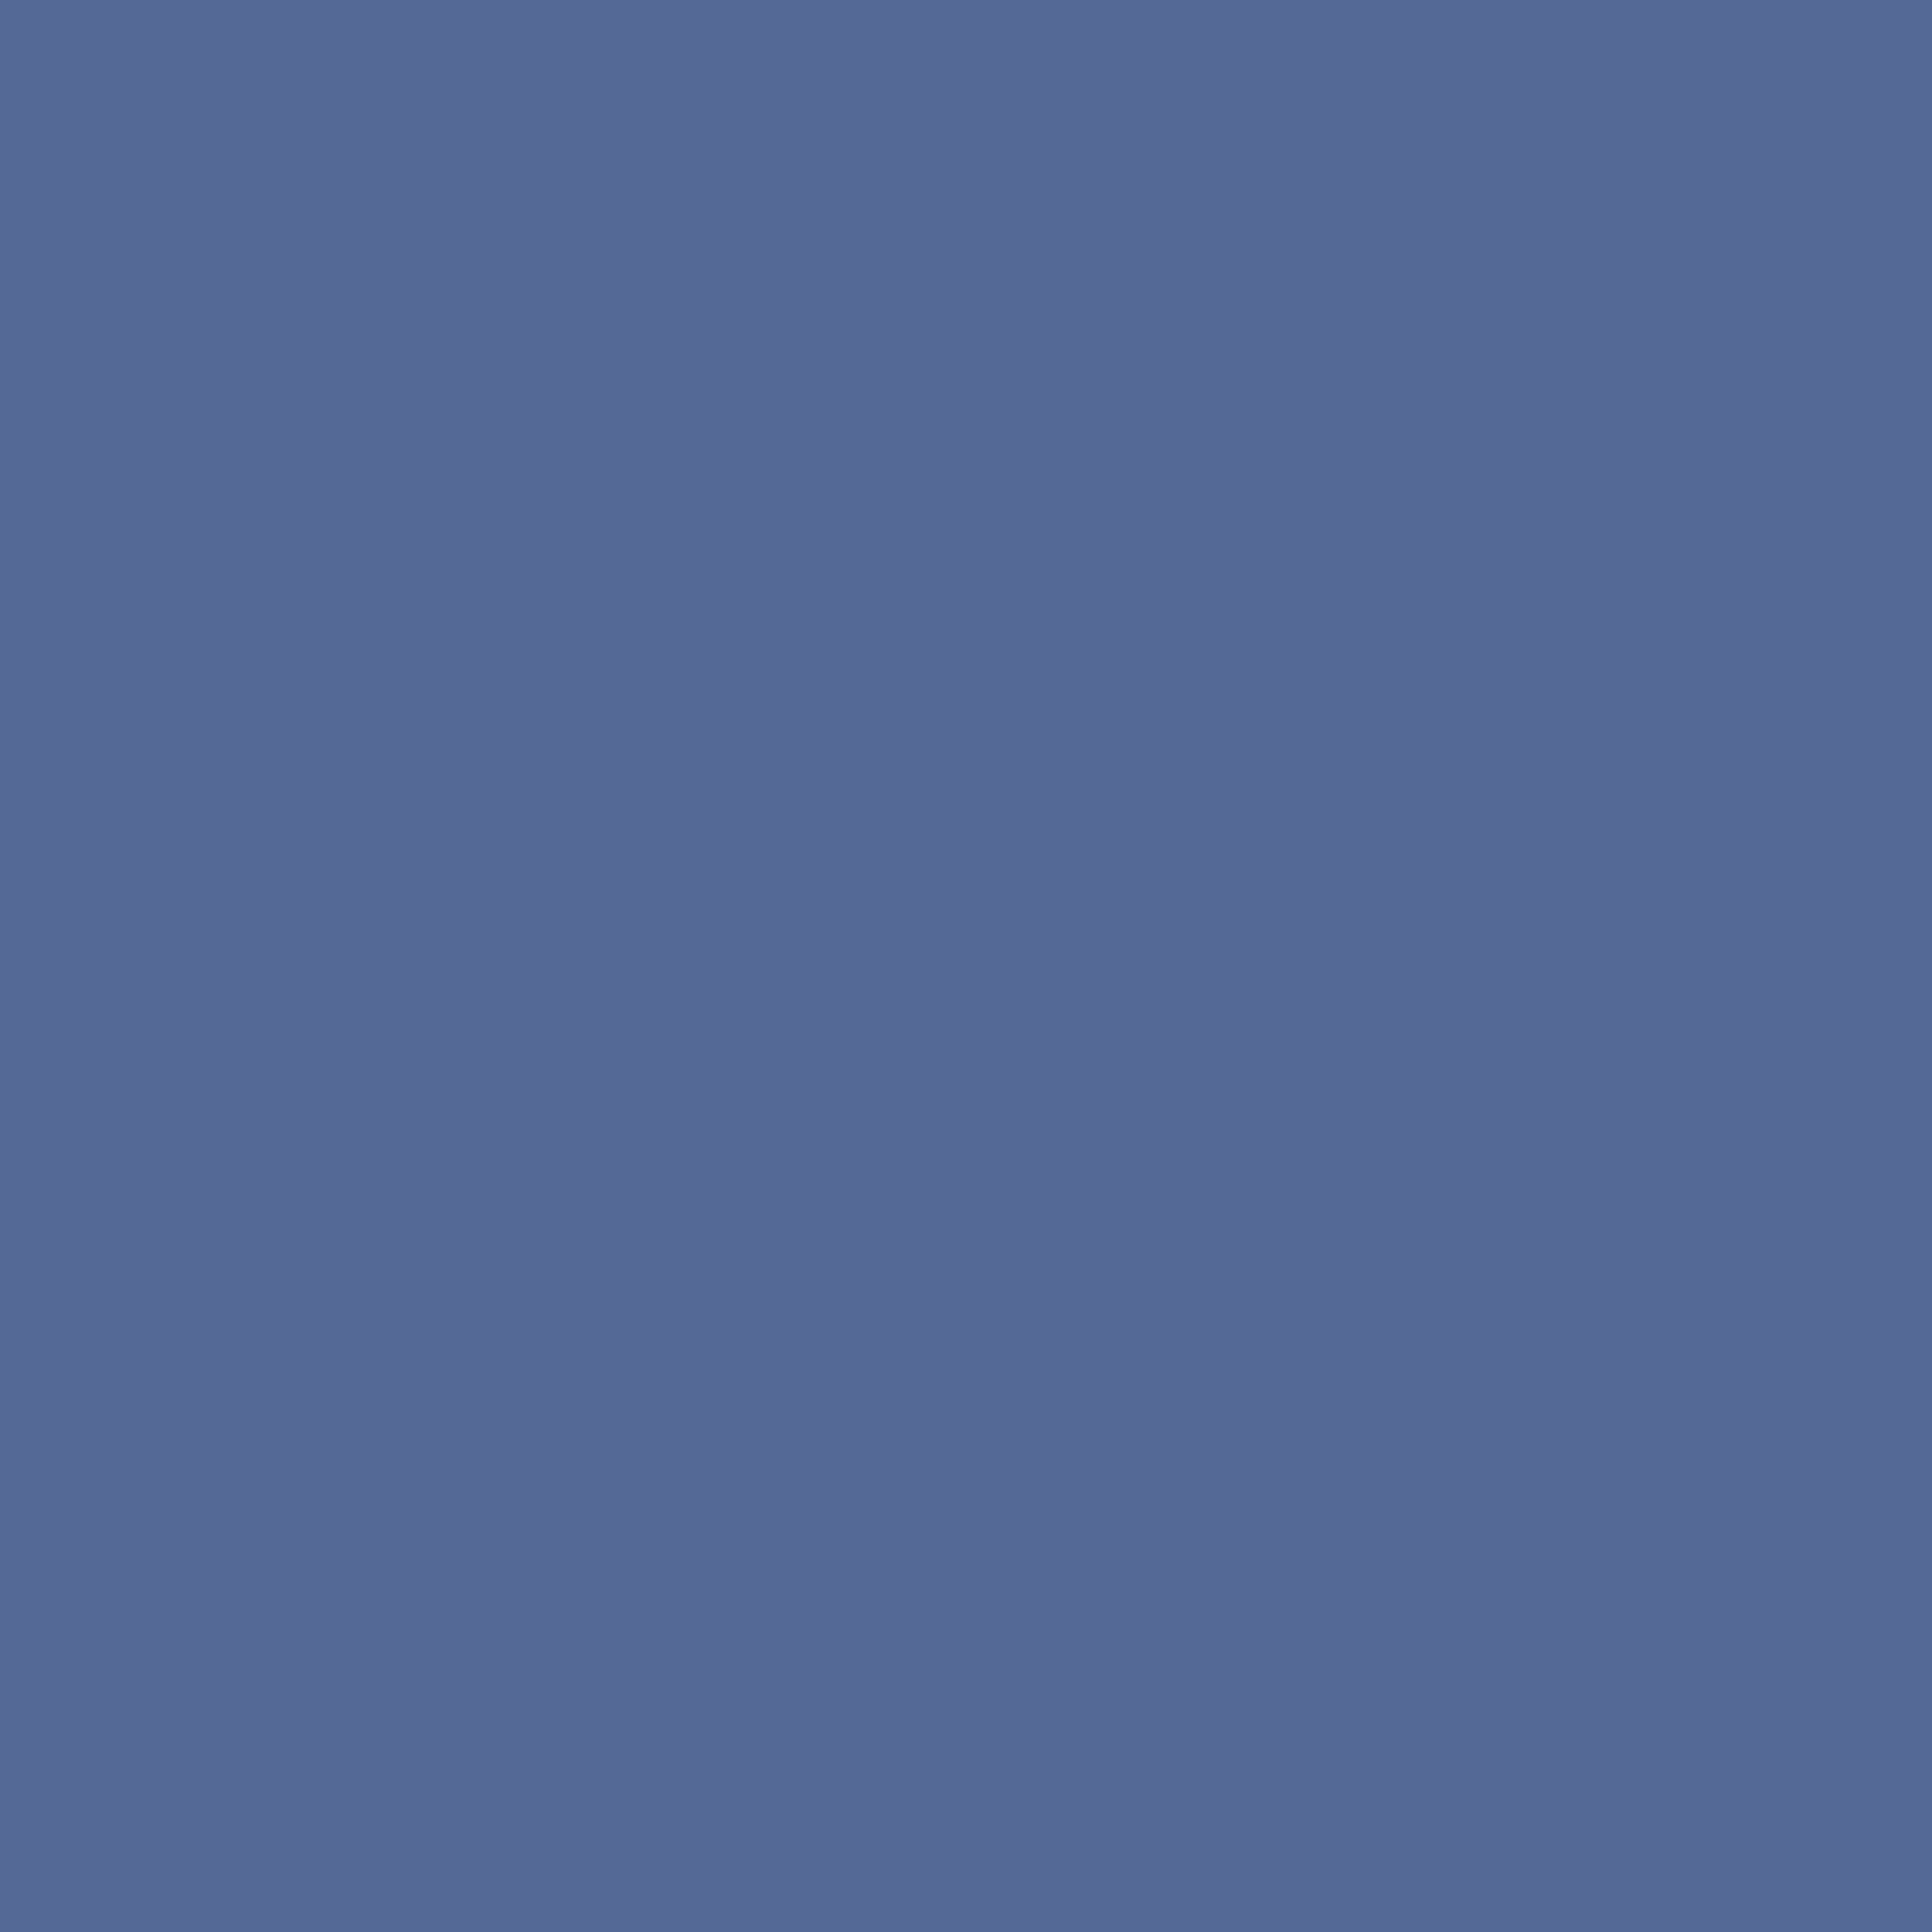 2732x2732 UCLA Blue Solid Color Background